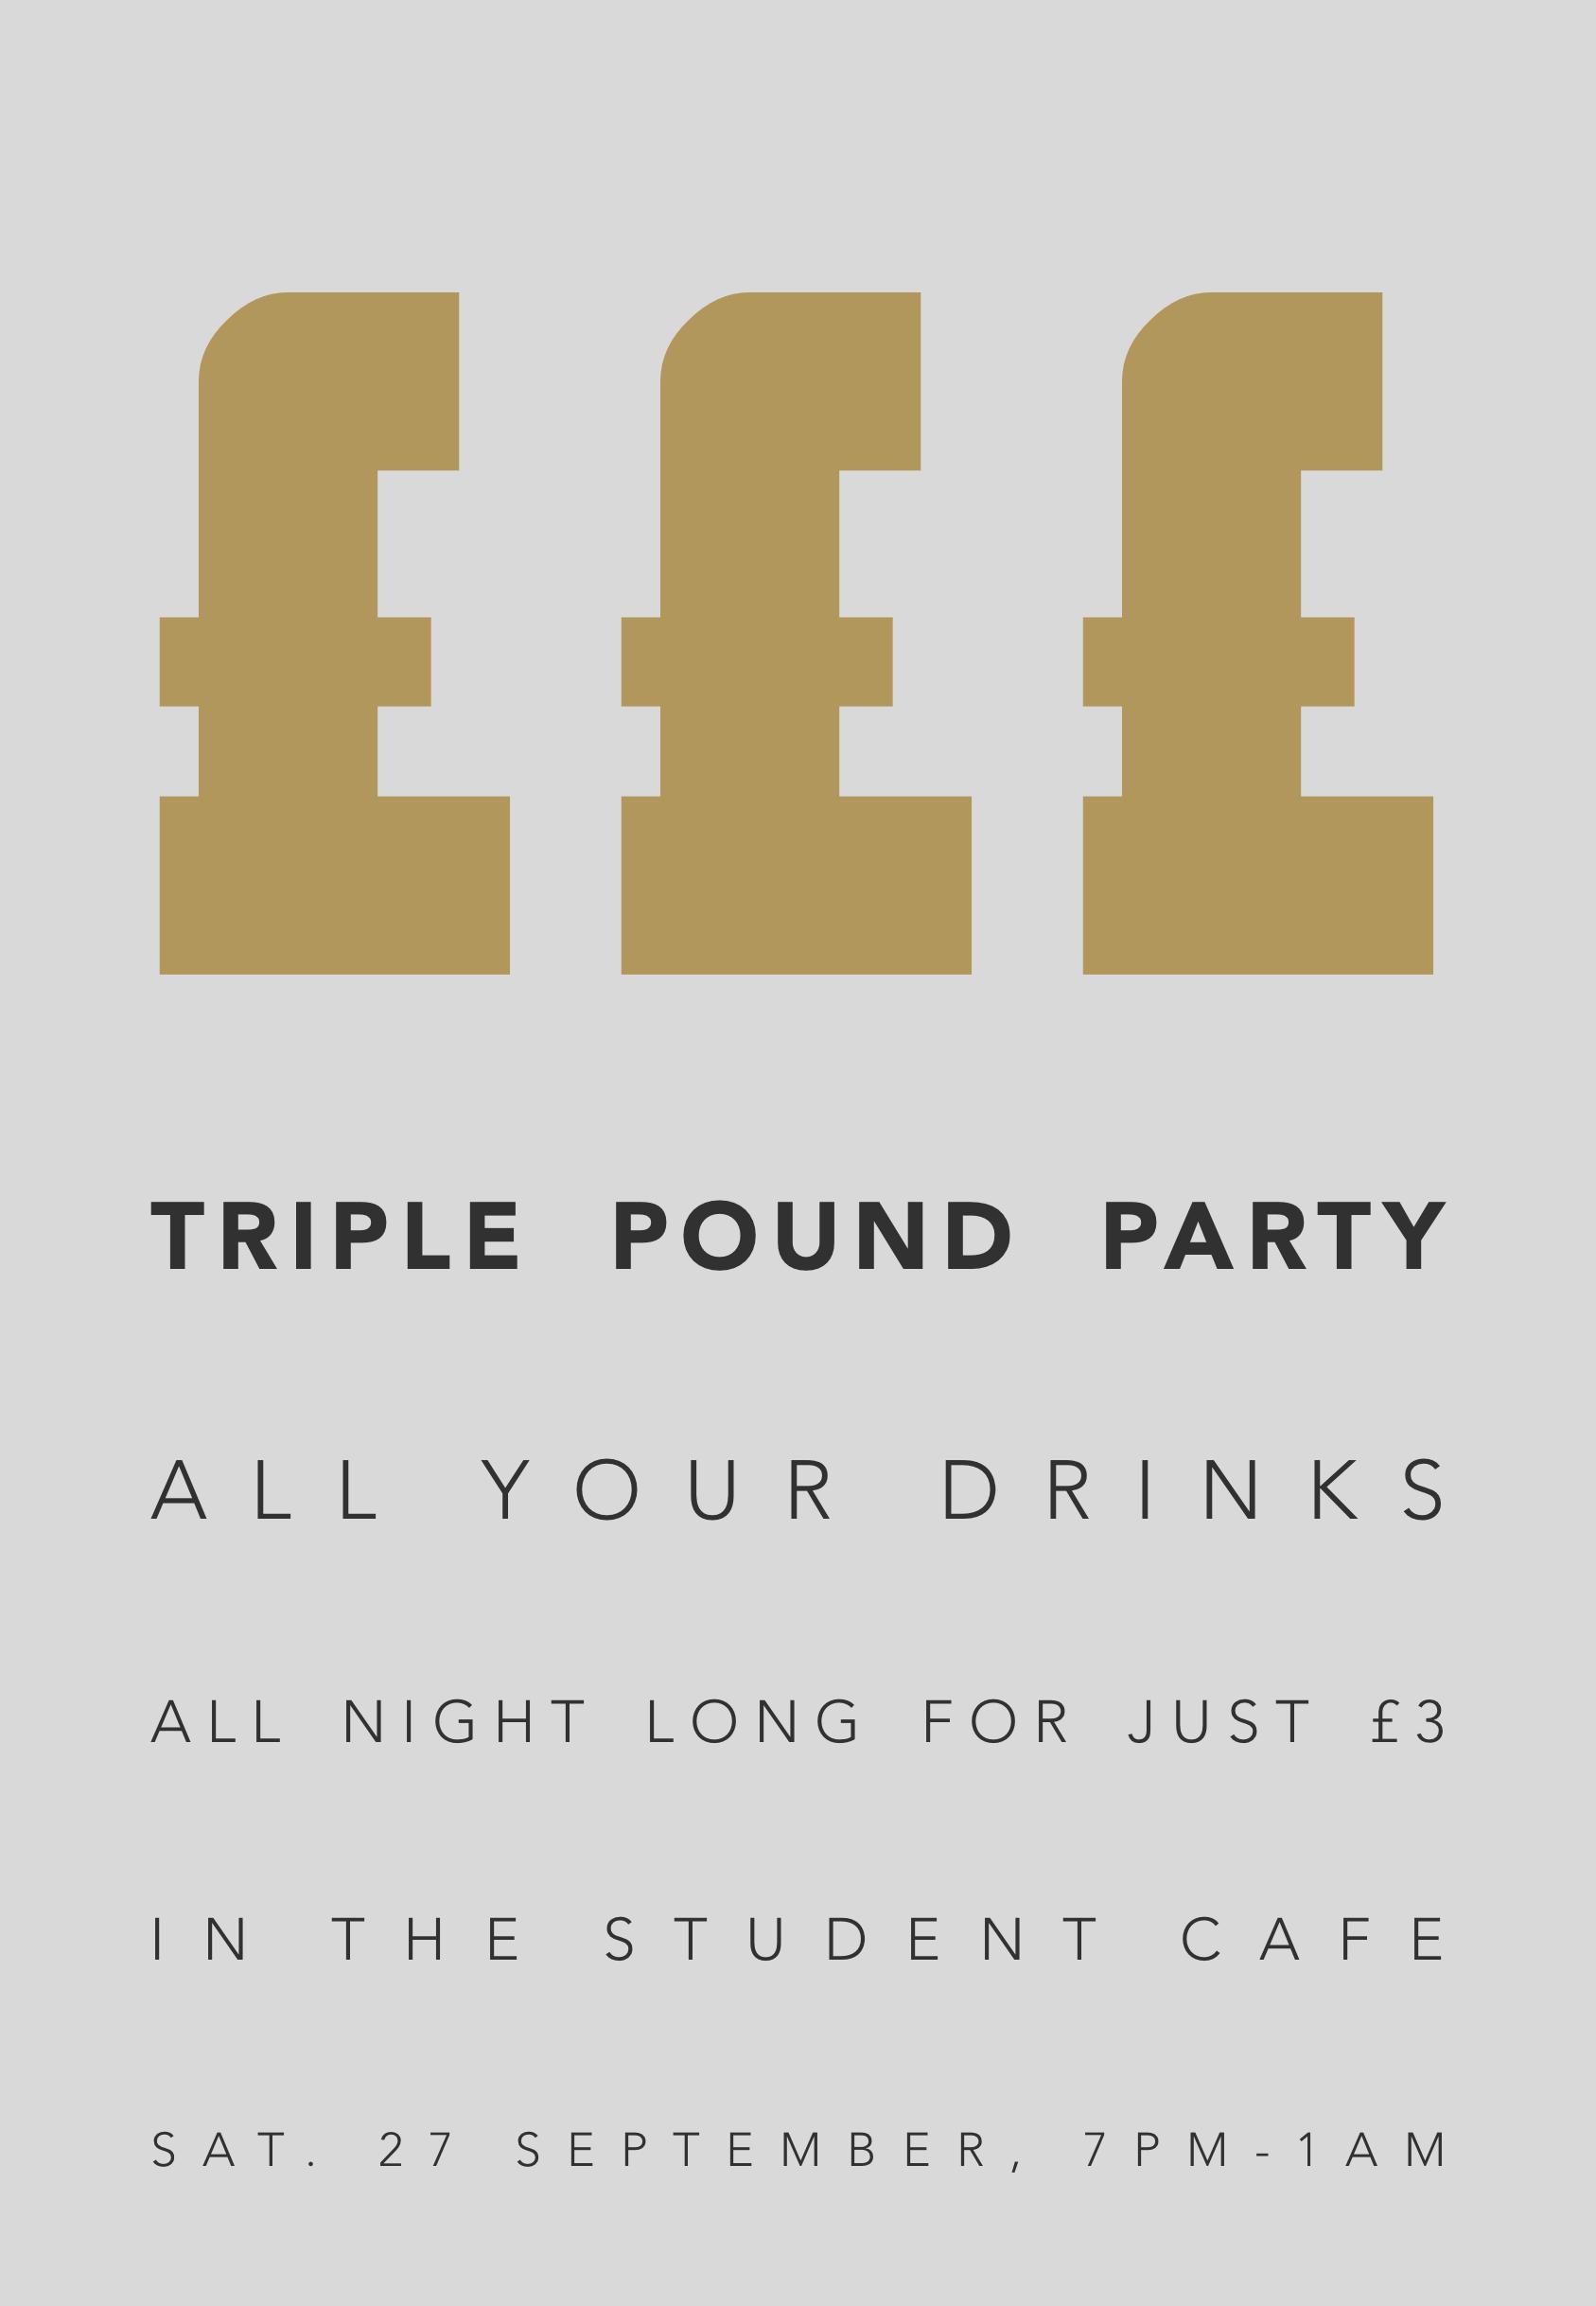 6 Saturday 2 - Triple Pound Party